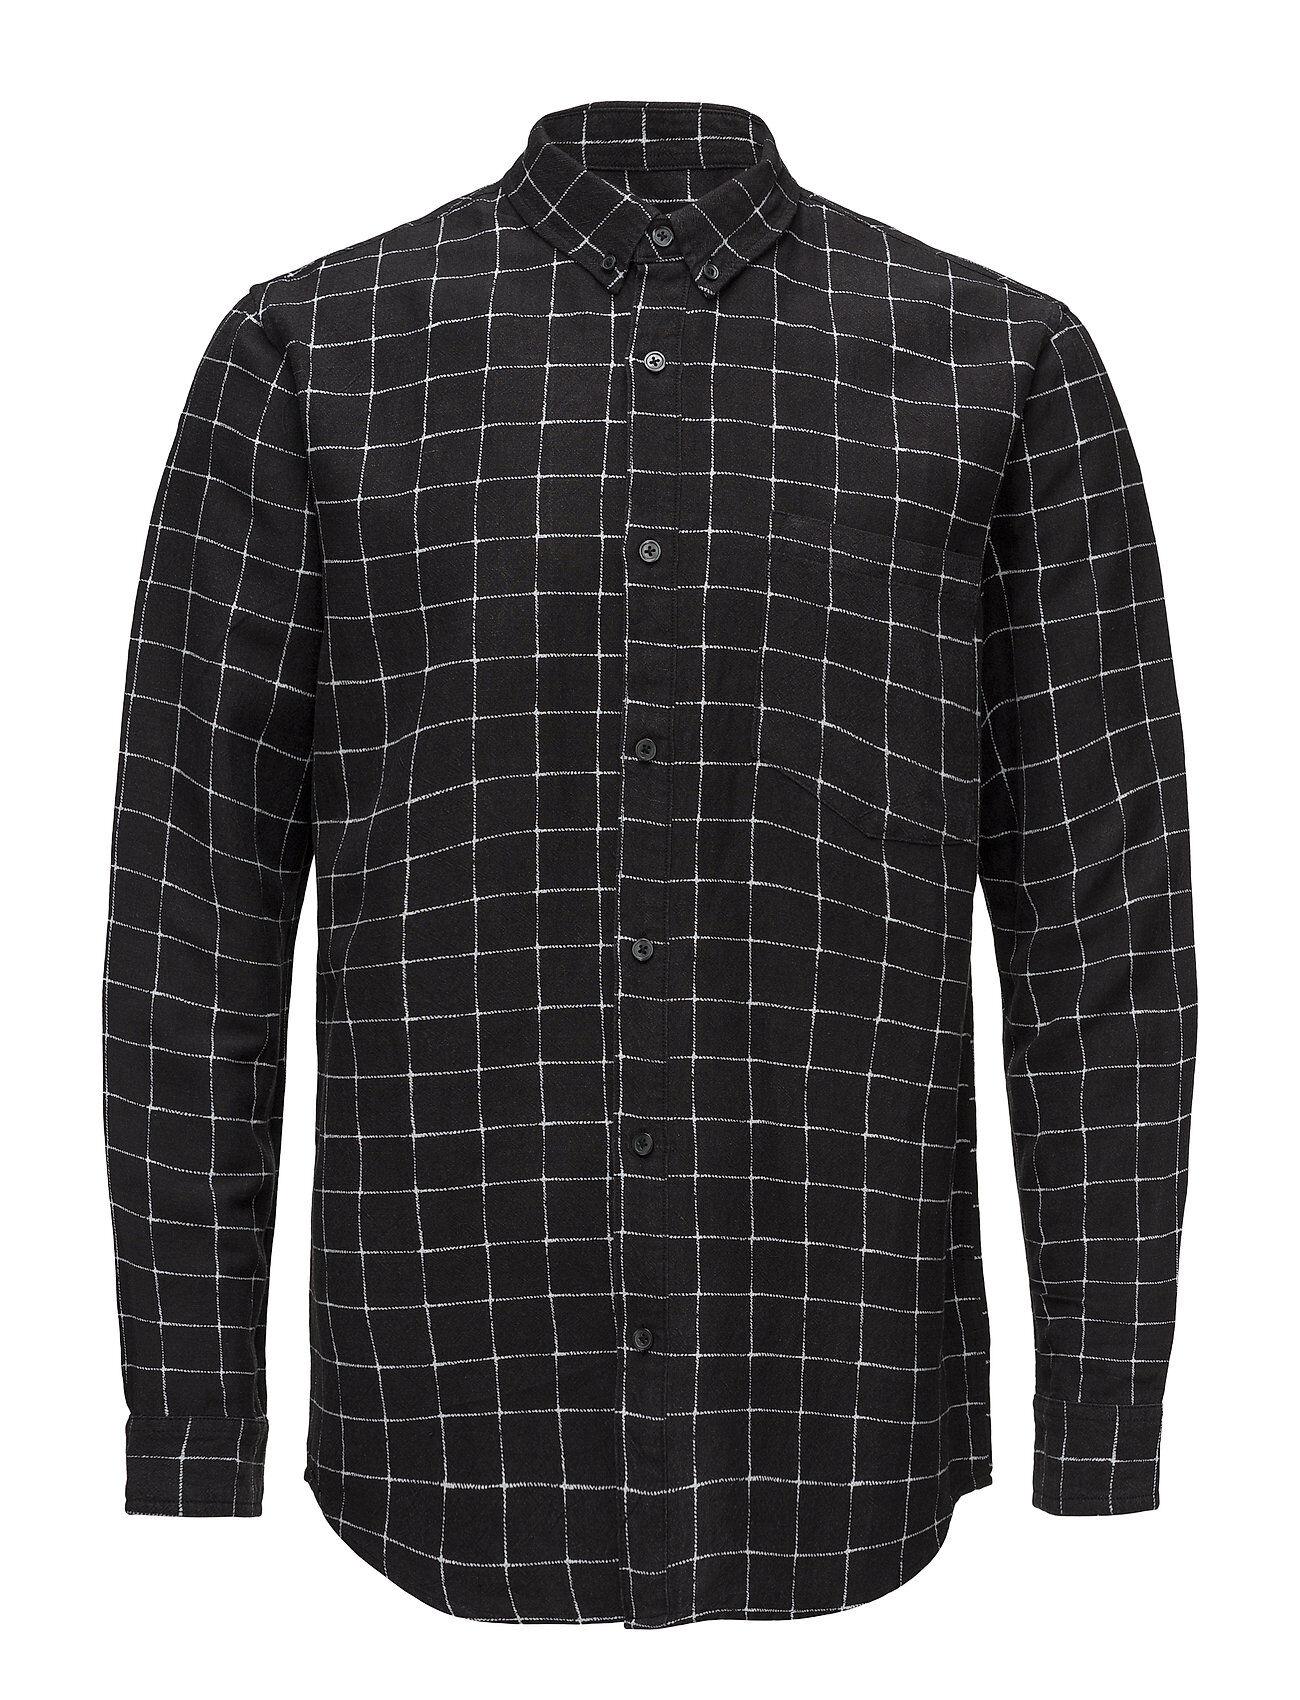 NEUW Check L/S Shirt